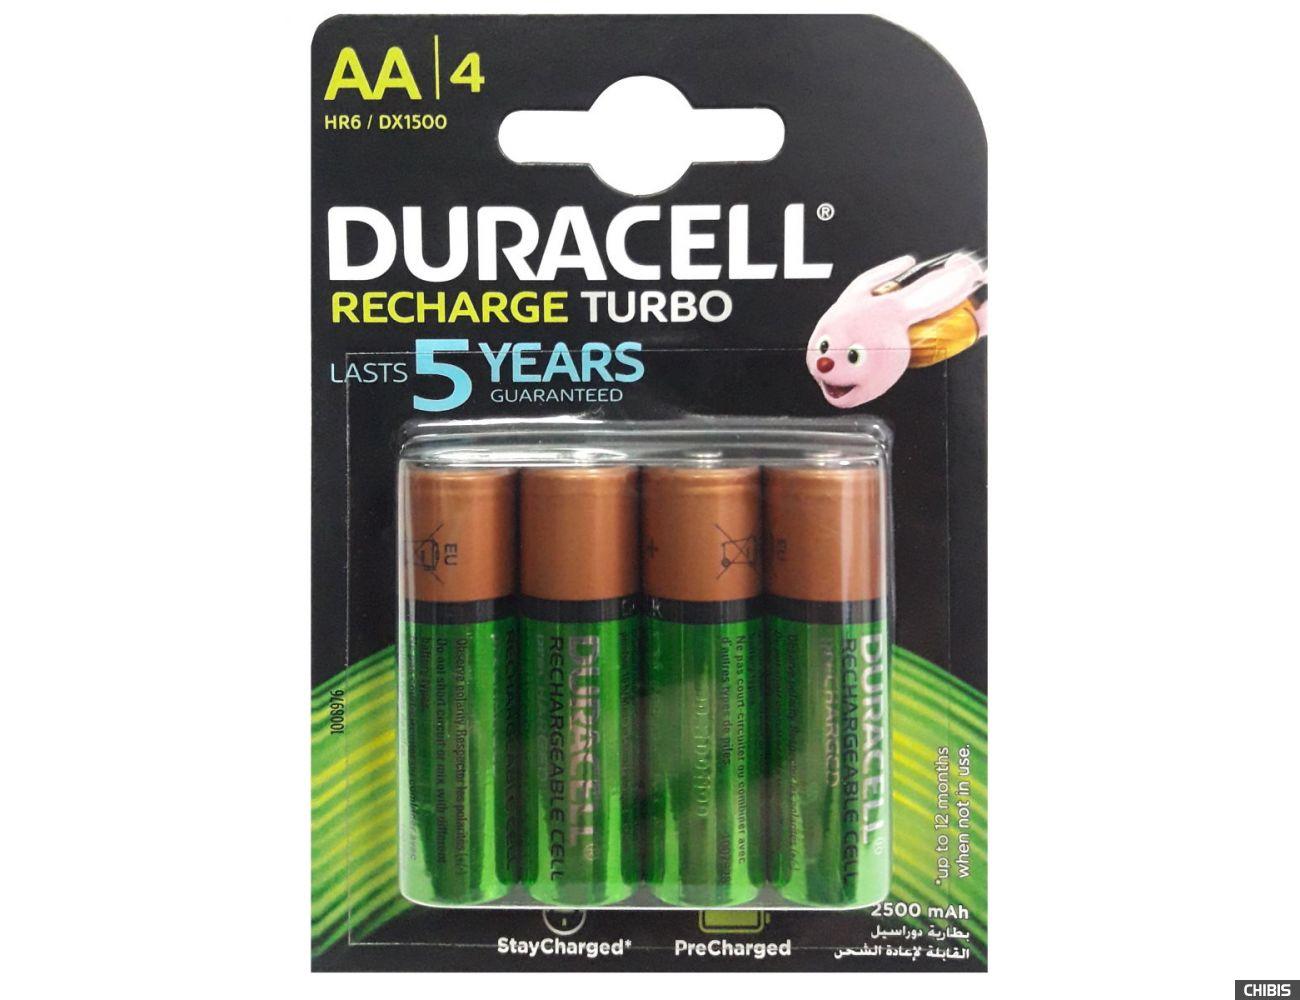 Аккумуляторы AA Duracell 2500 mAh Turbo HR6 Ni-Mh 1.2V 4 шт.